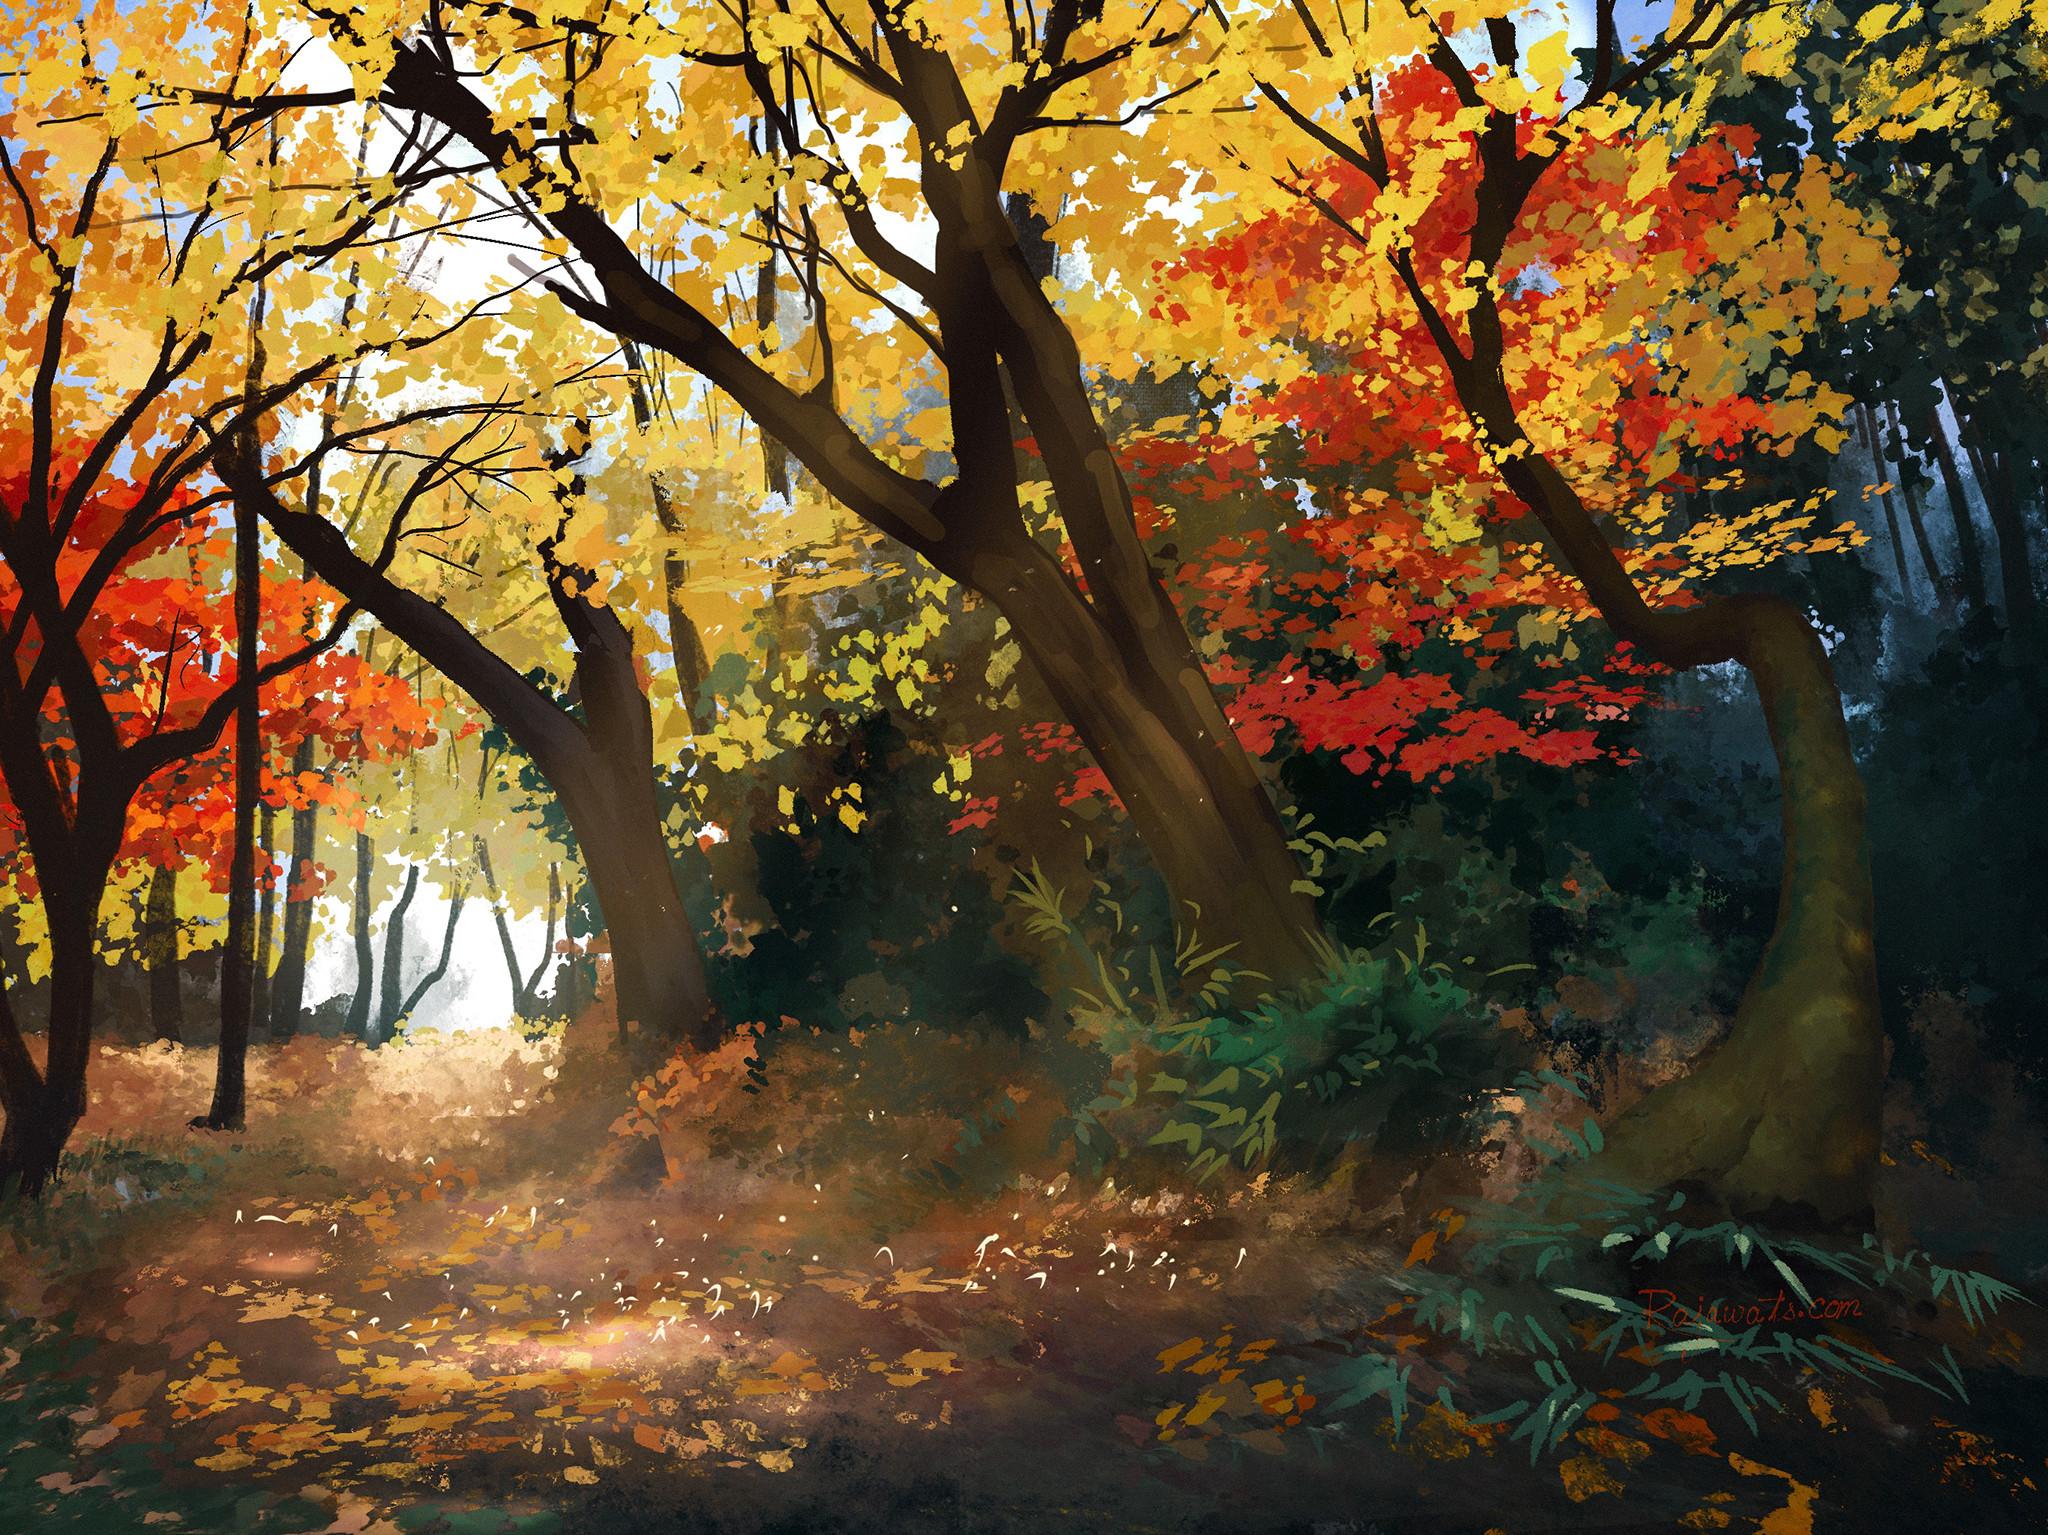 Park near Ghibli museum